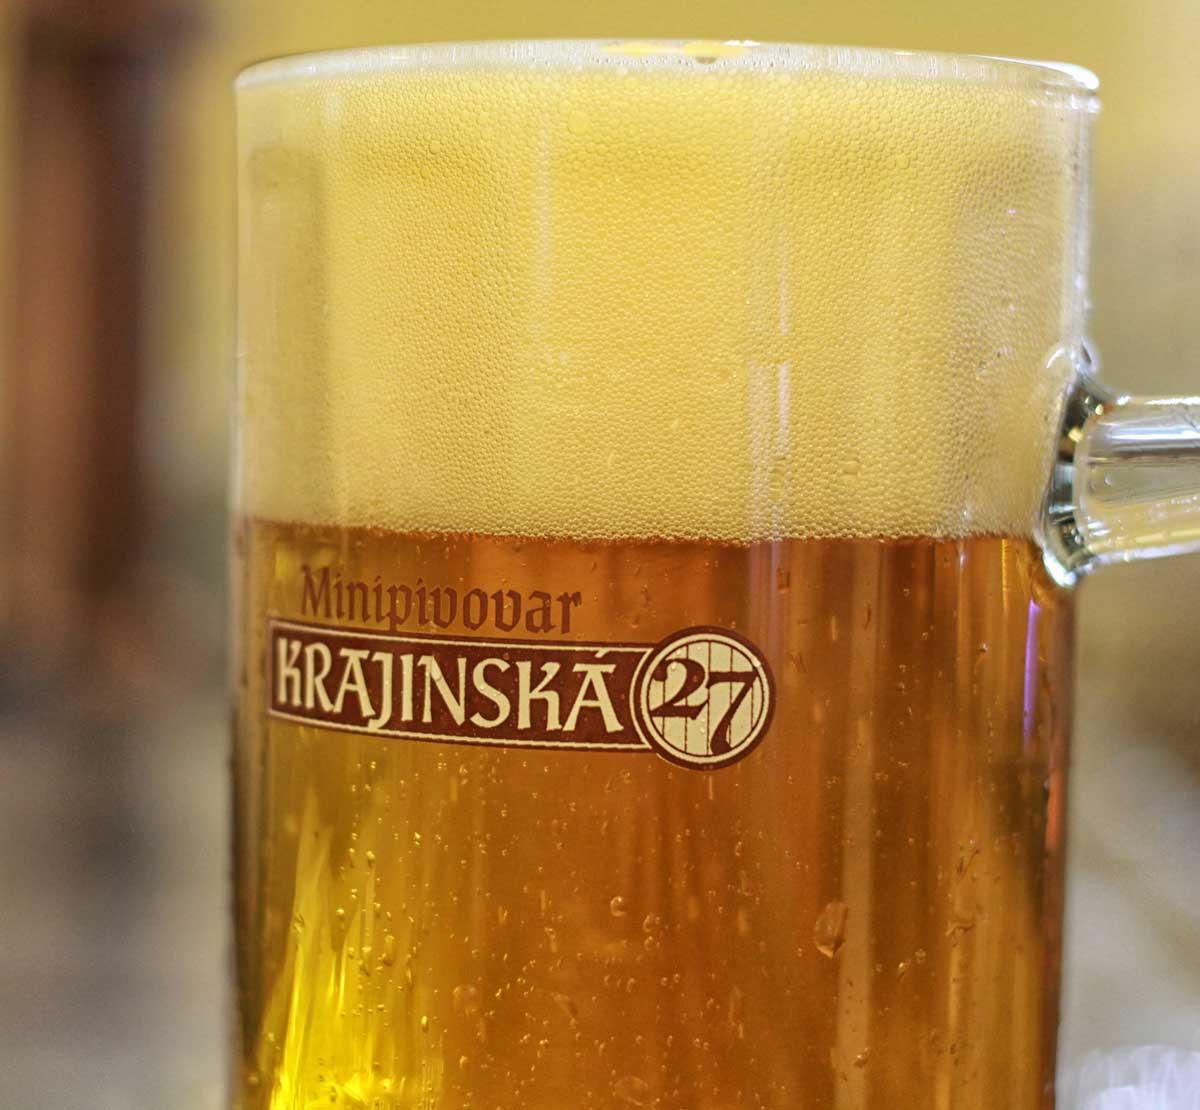 krajinska27-nase-piva-blondyna-1